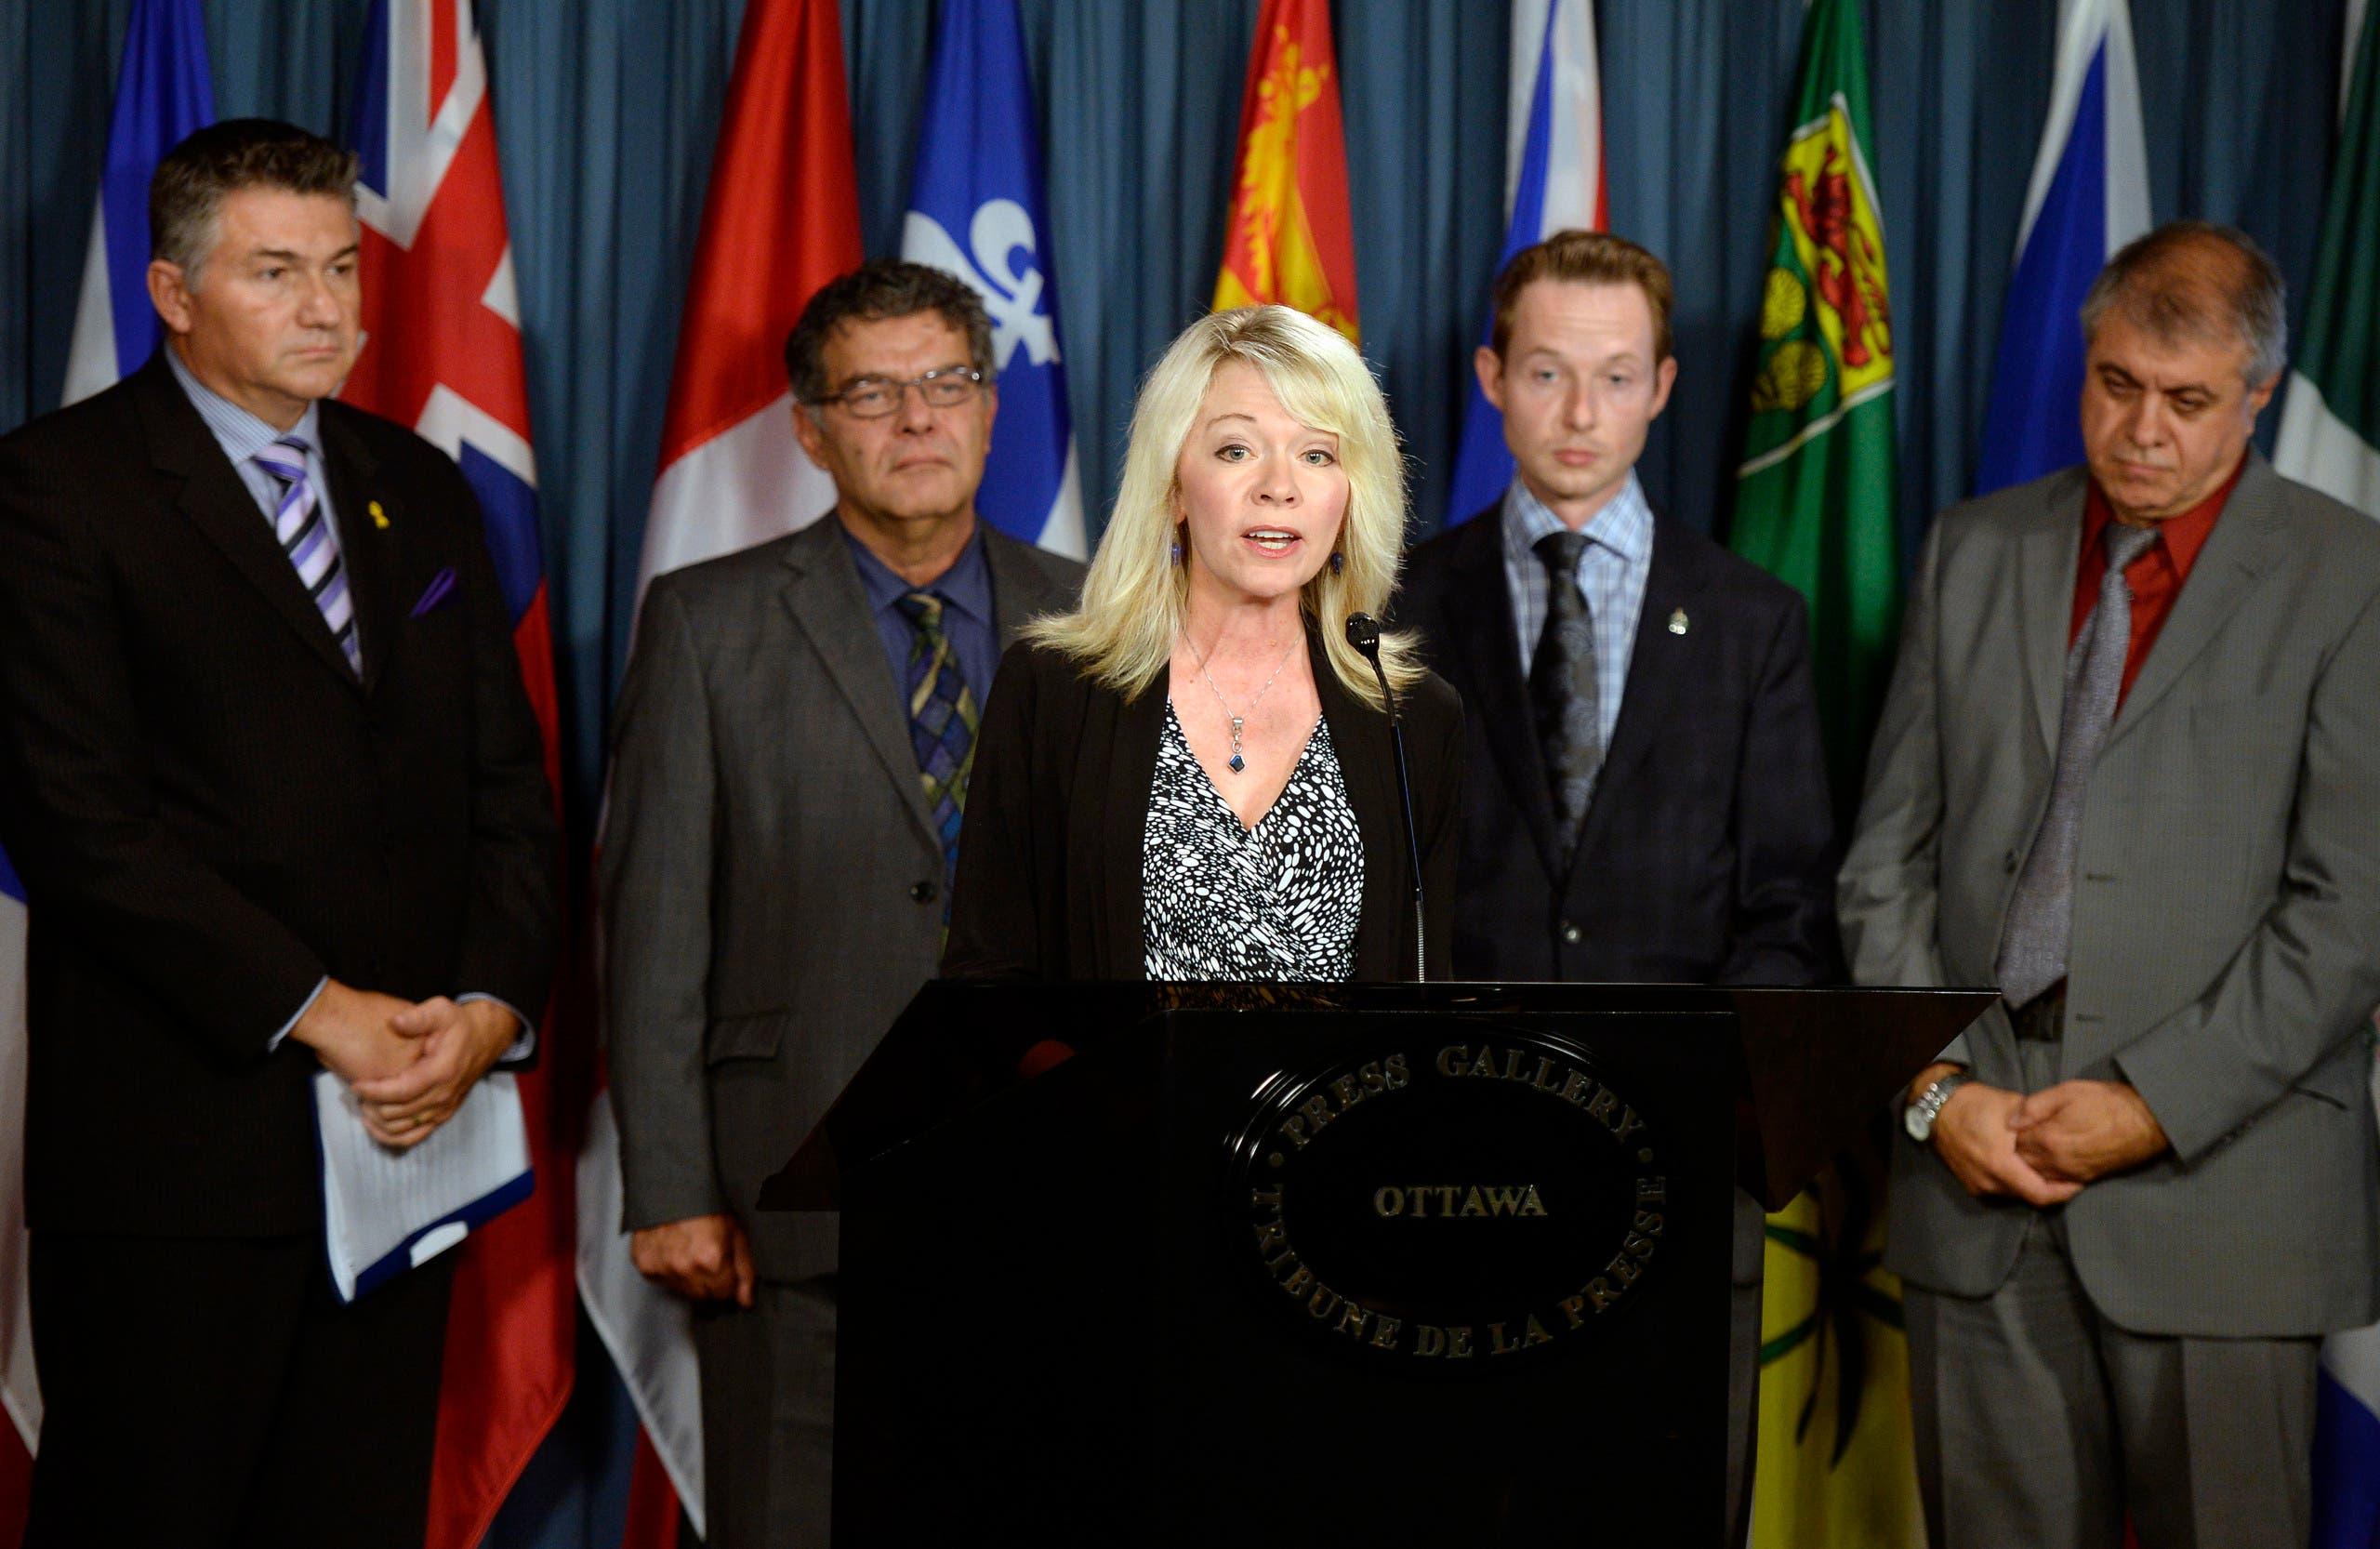 برلمانيون كنديون يطالبون بتحقيق أممي في مجازر إيران 187caf42-4c10-4bcd-a25e-9dc3b4cbf9b0